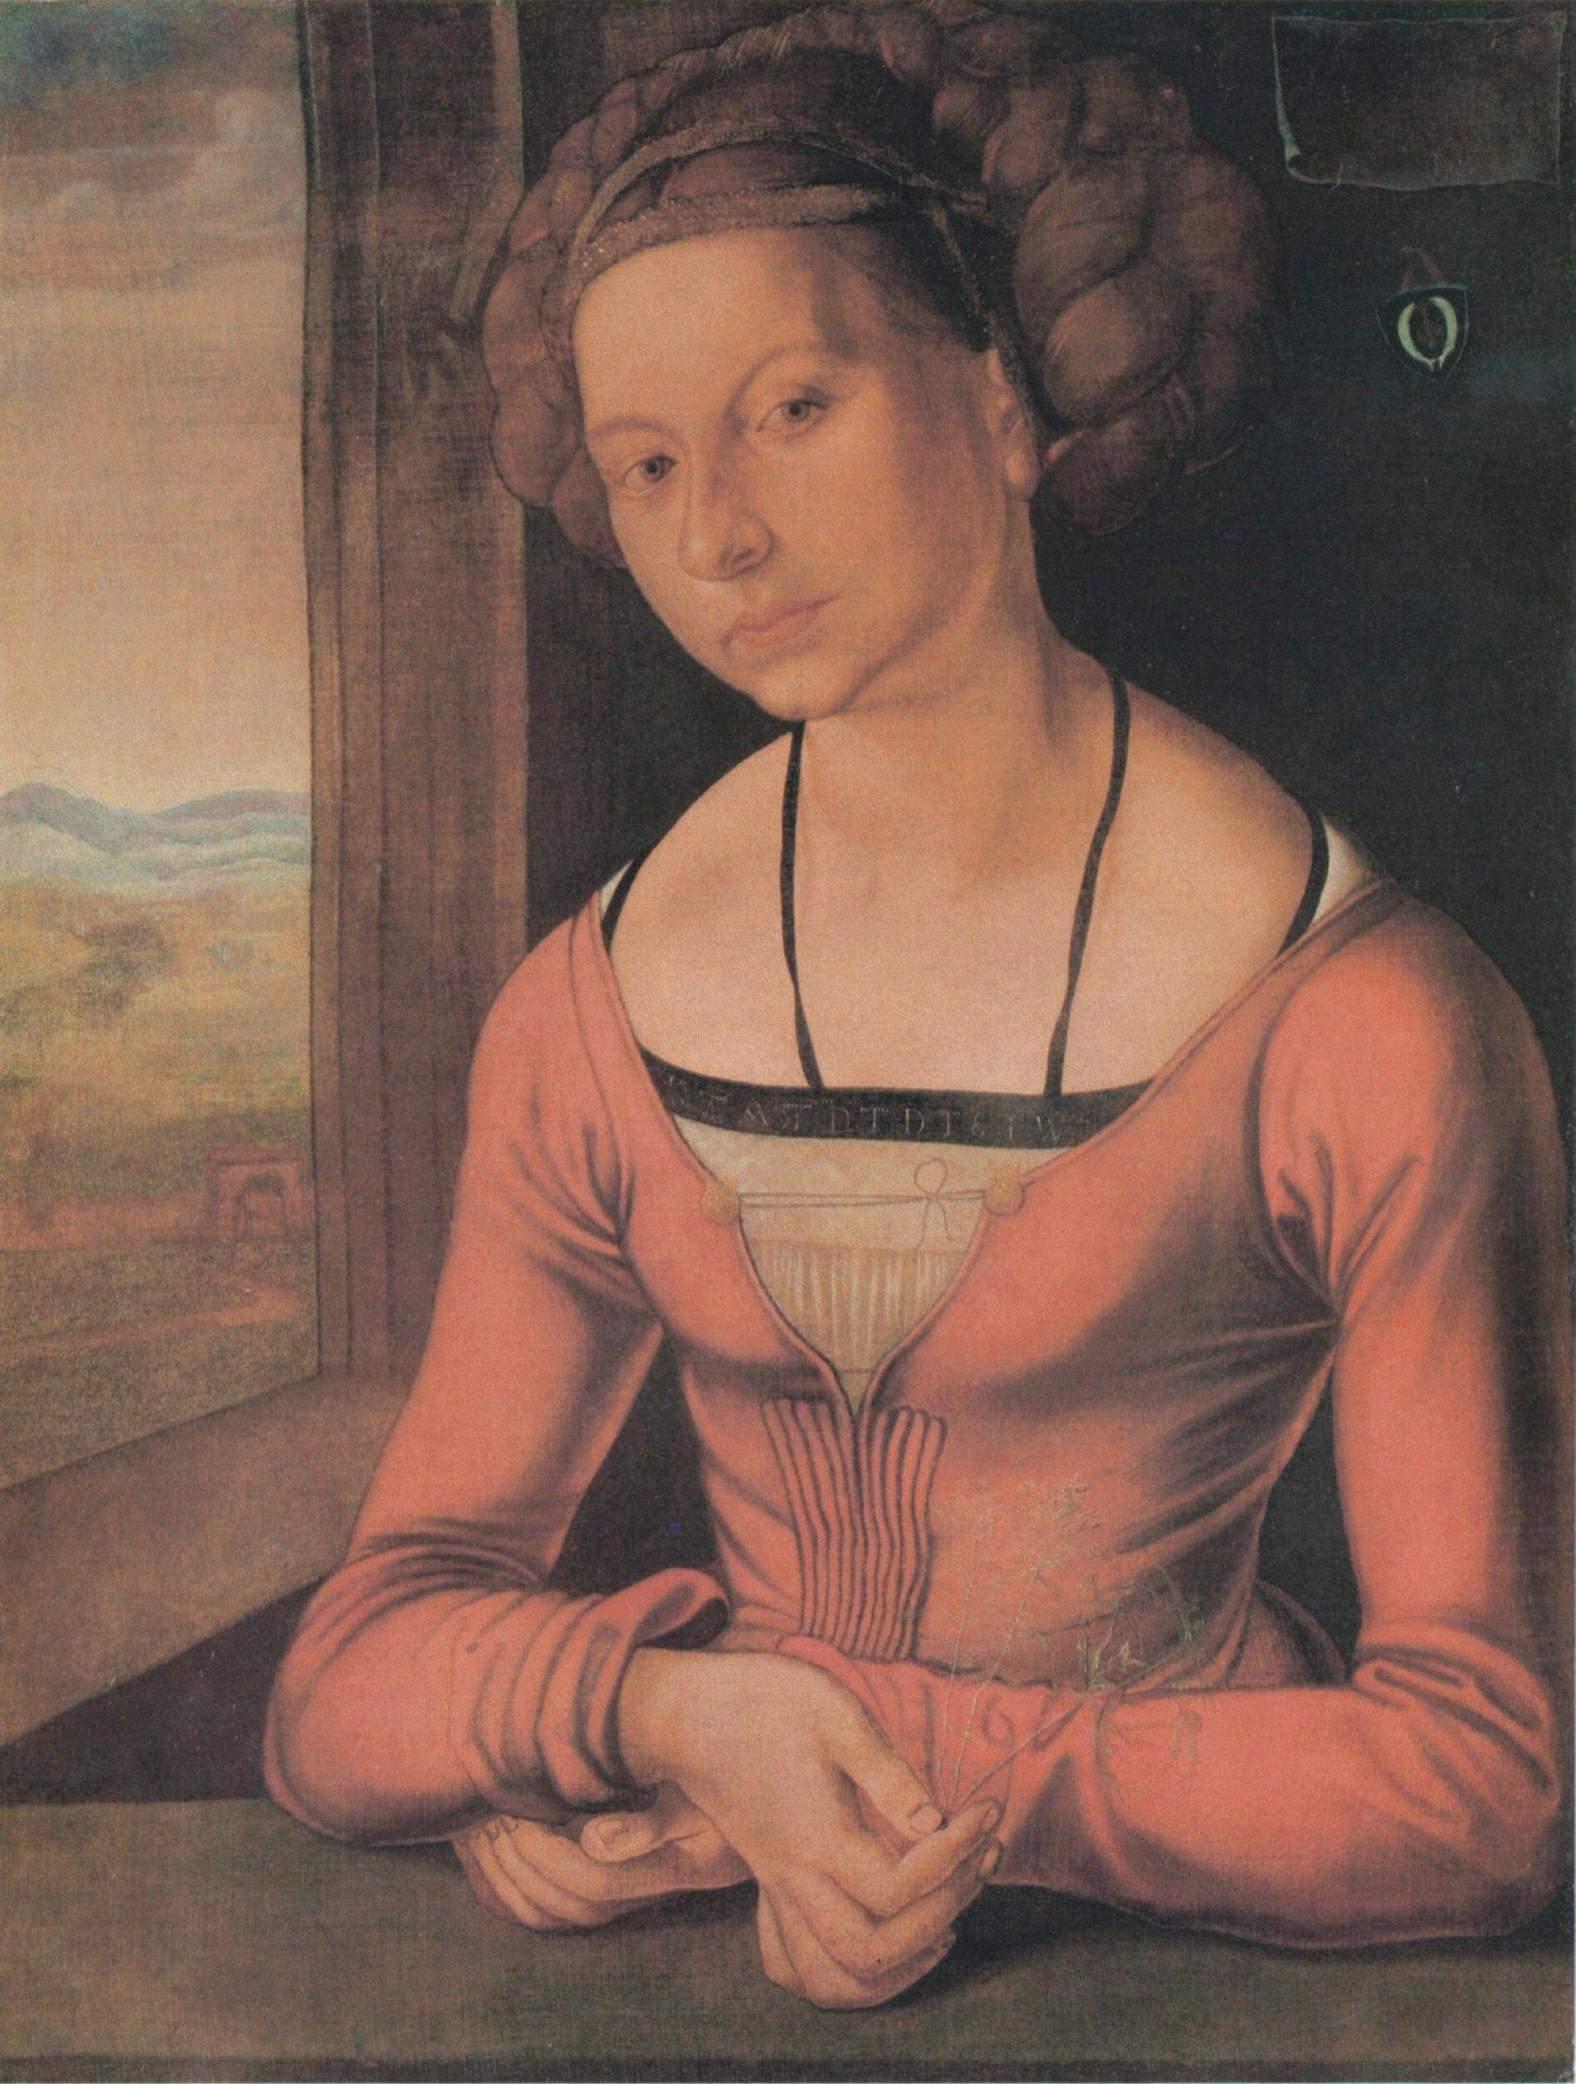 Plan Cul Vierge, Femme Moche D'Arras